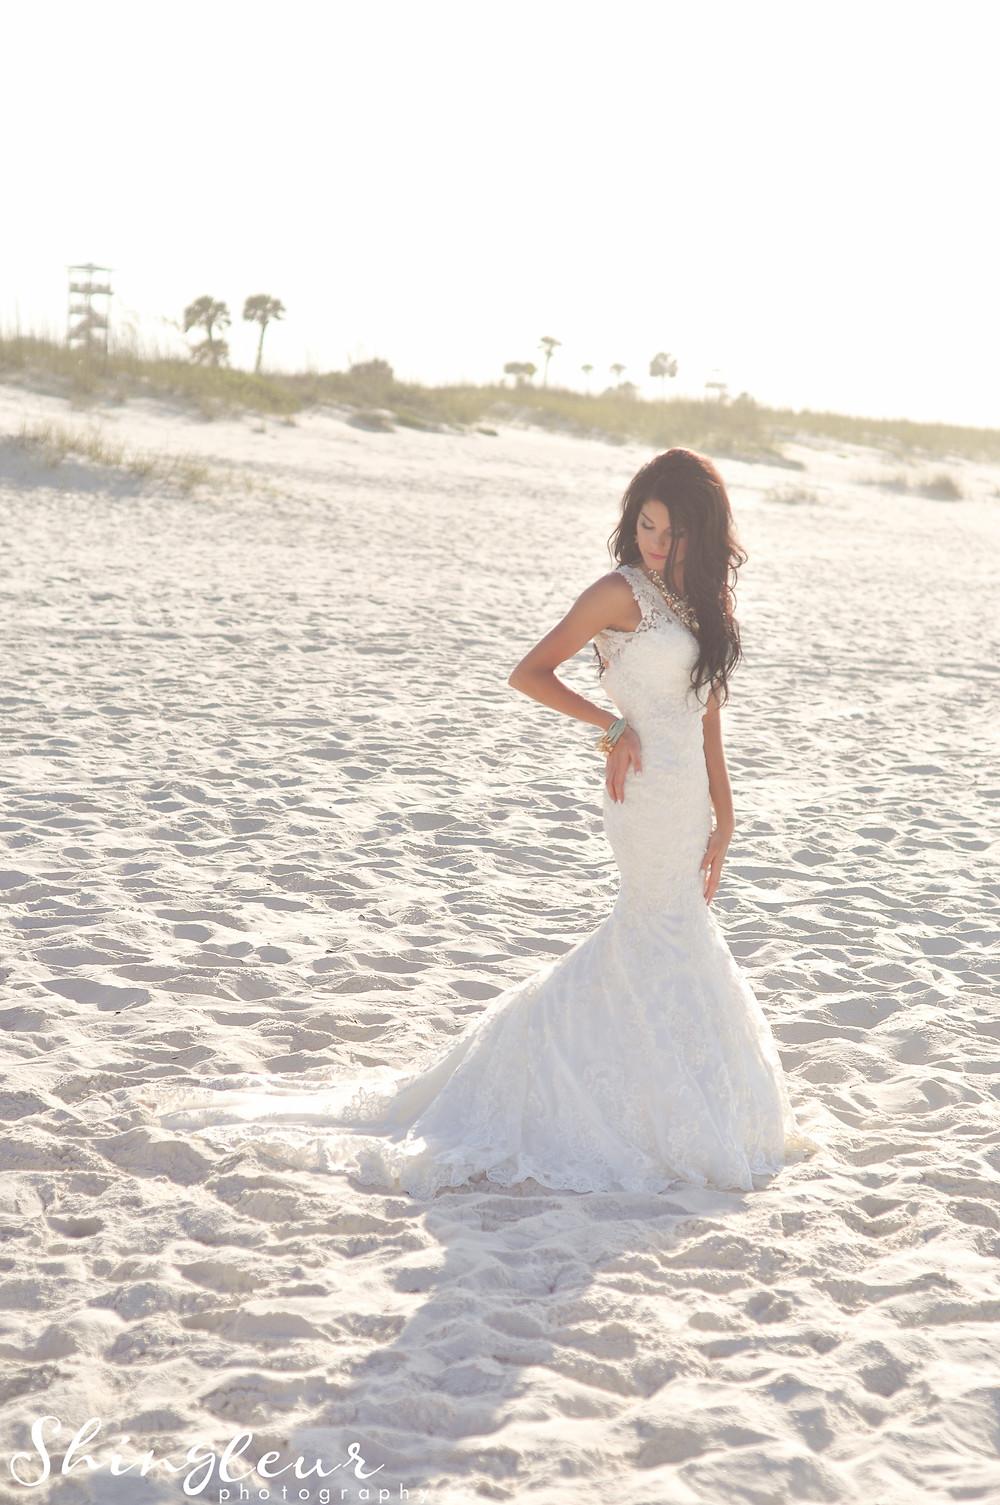 Bridals-1-2.jpg